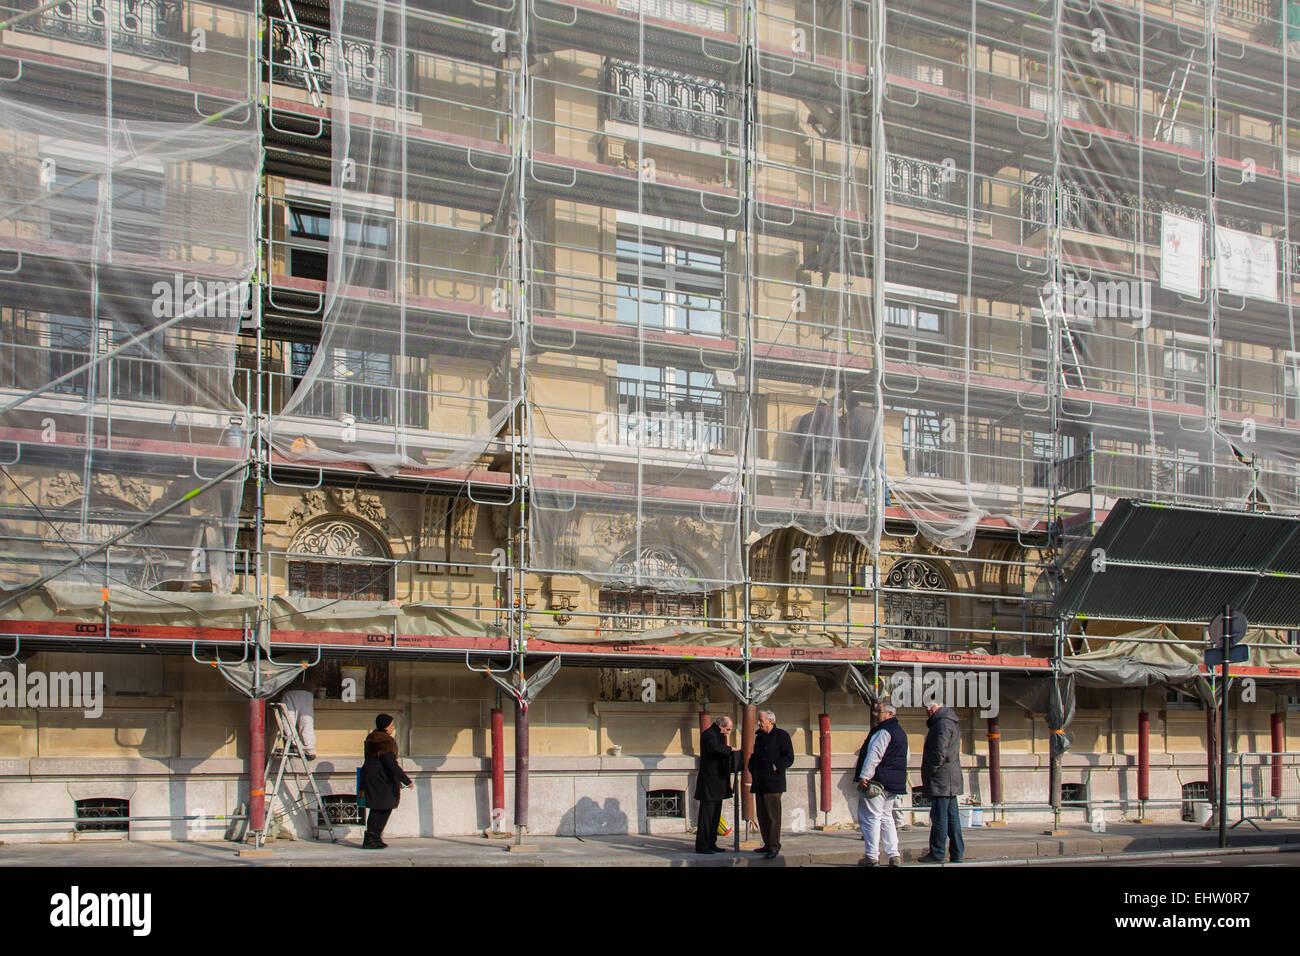 SCAFFOLDING, RESTORATION OF A BUILDING FACADE - Stock Image